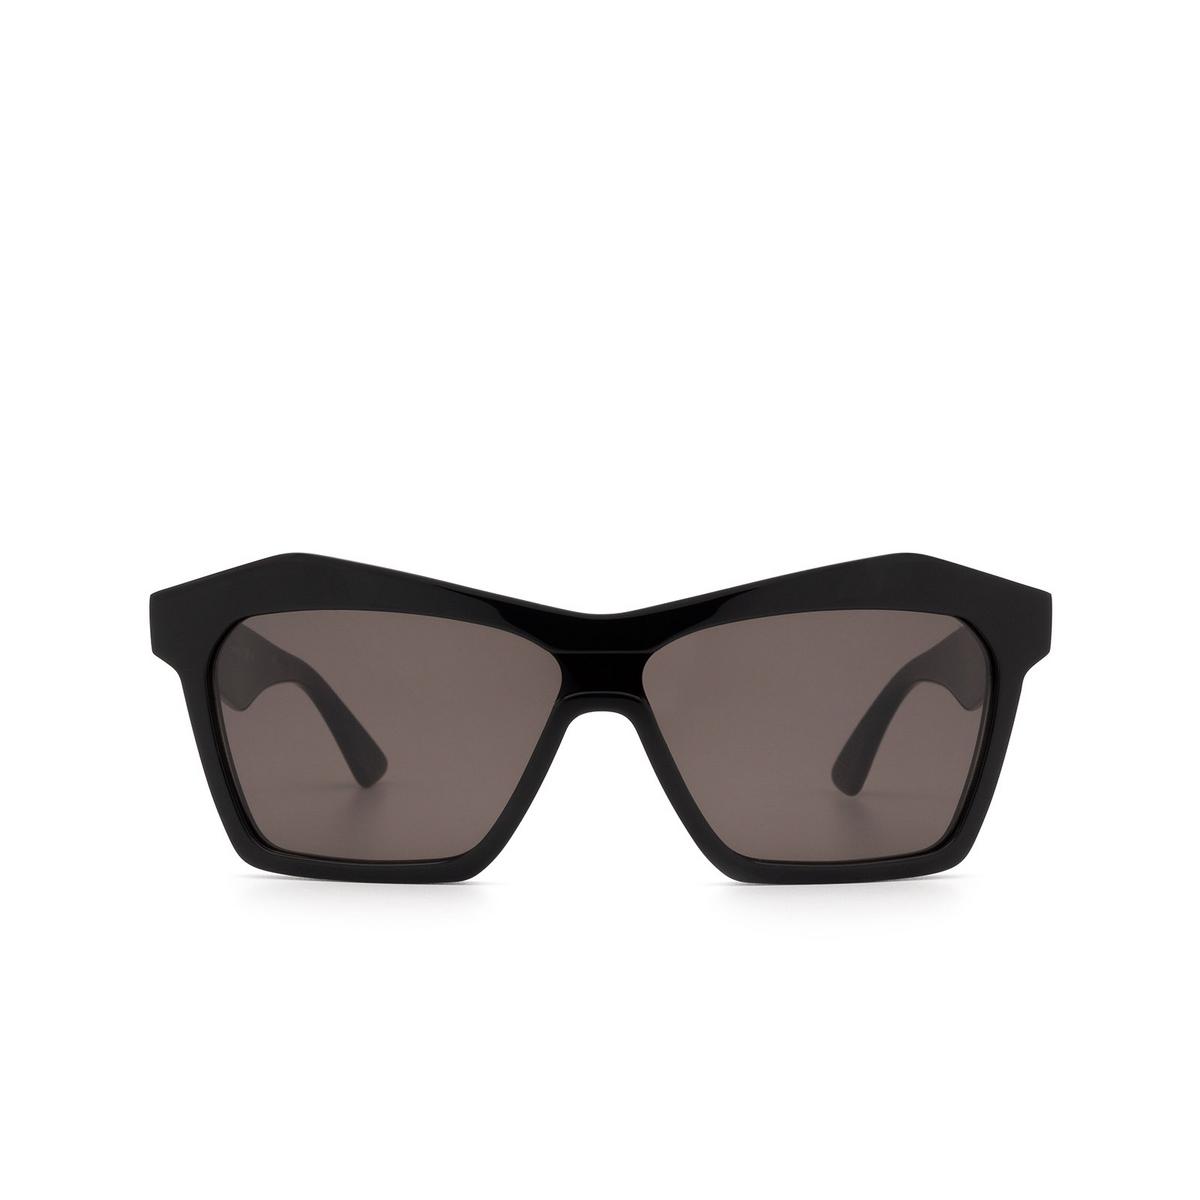 Bottega Veneta® Irregular Sunglasses: BV1093S color Black 001 - front view.